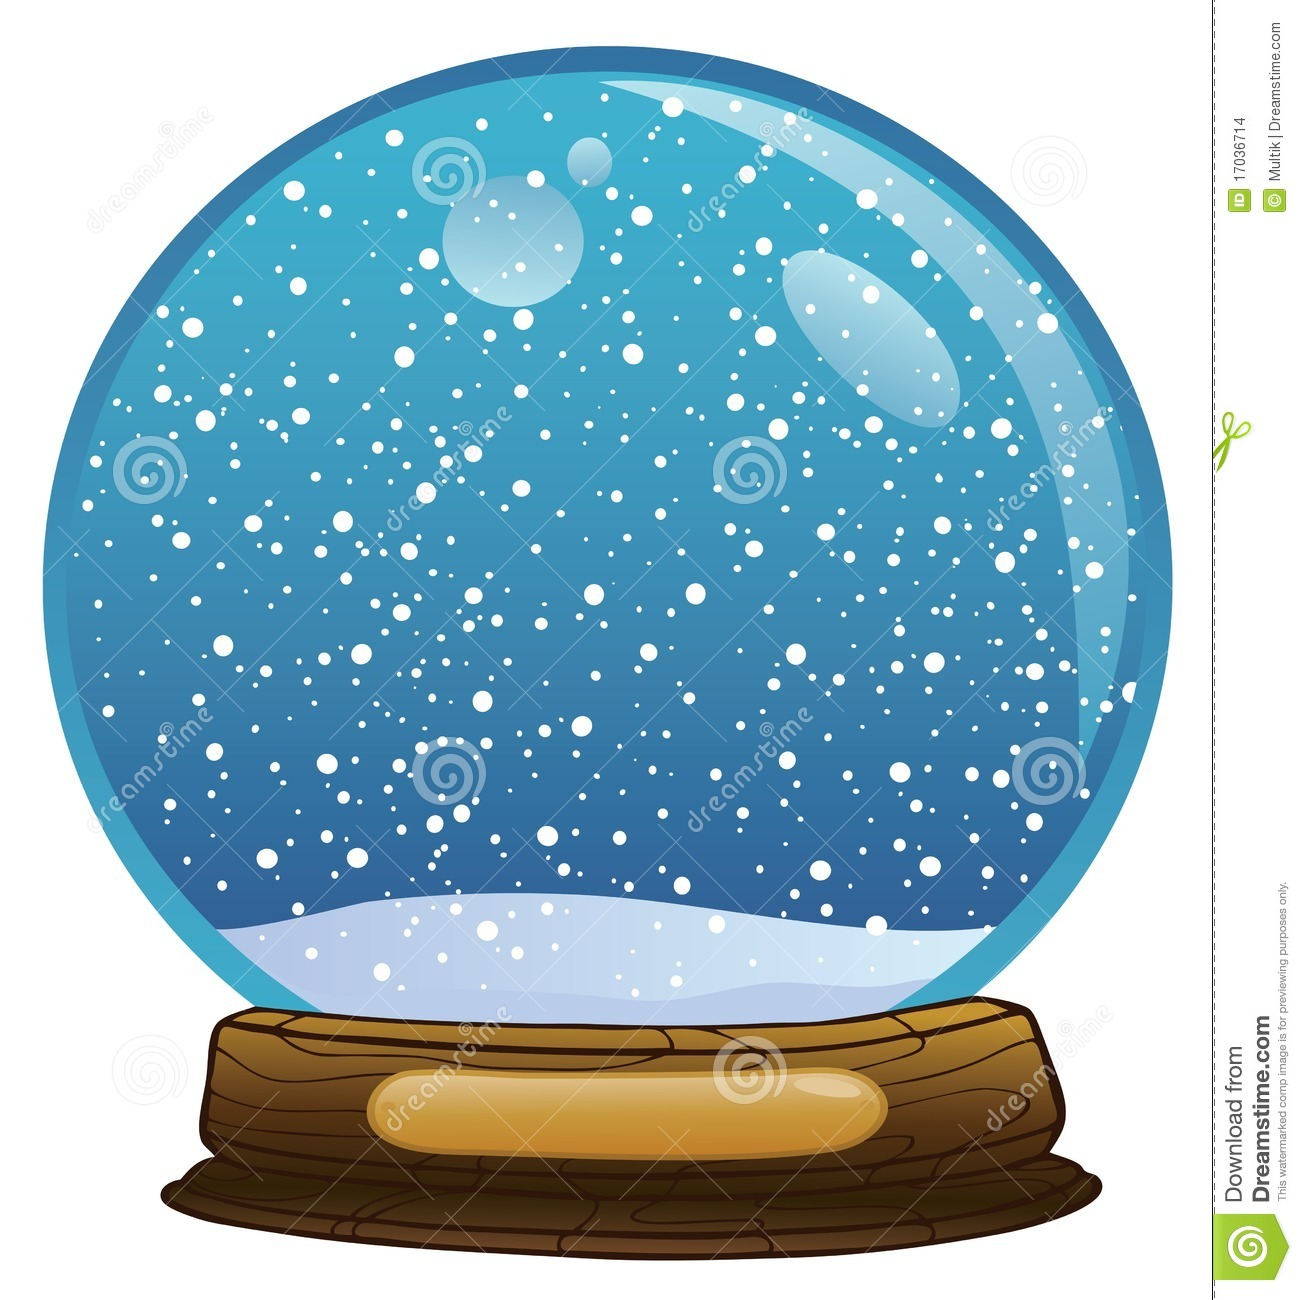 snow globe clipart clipground snow globe clipart free snow globe clipart black and white